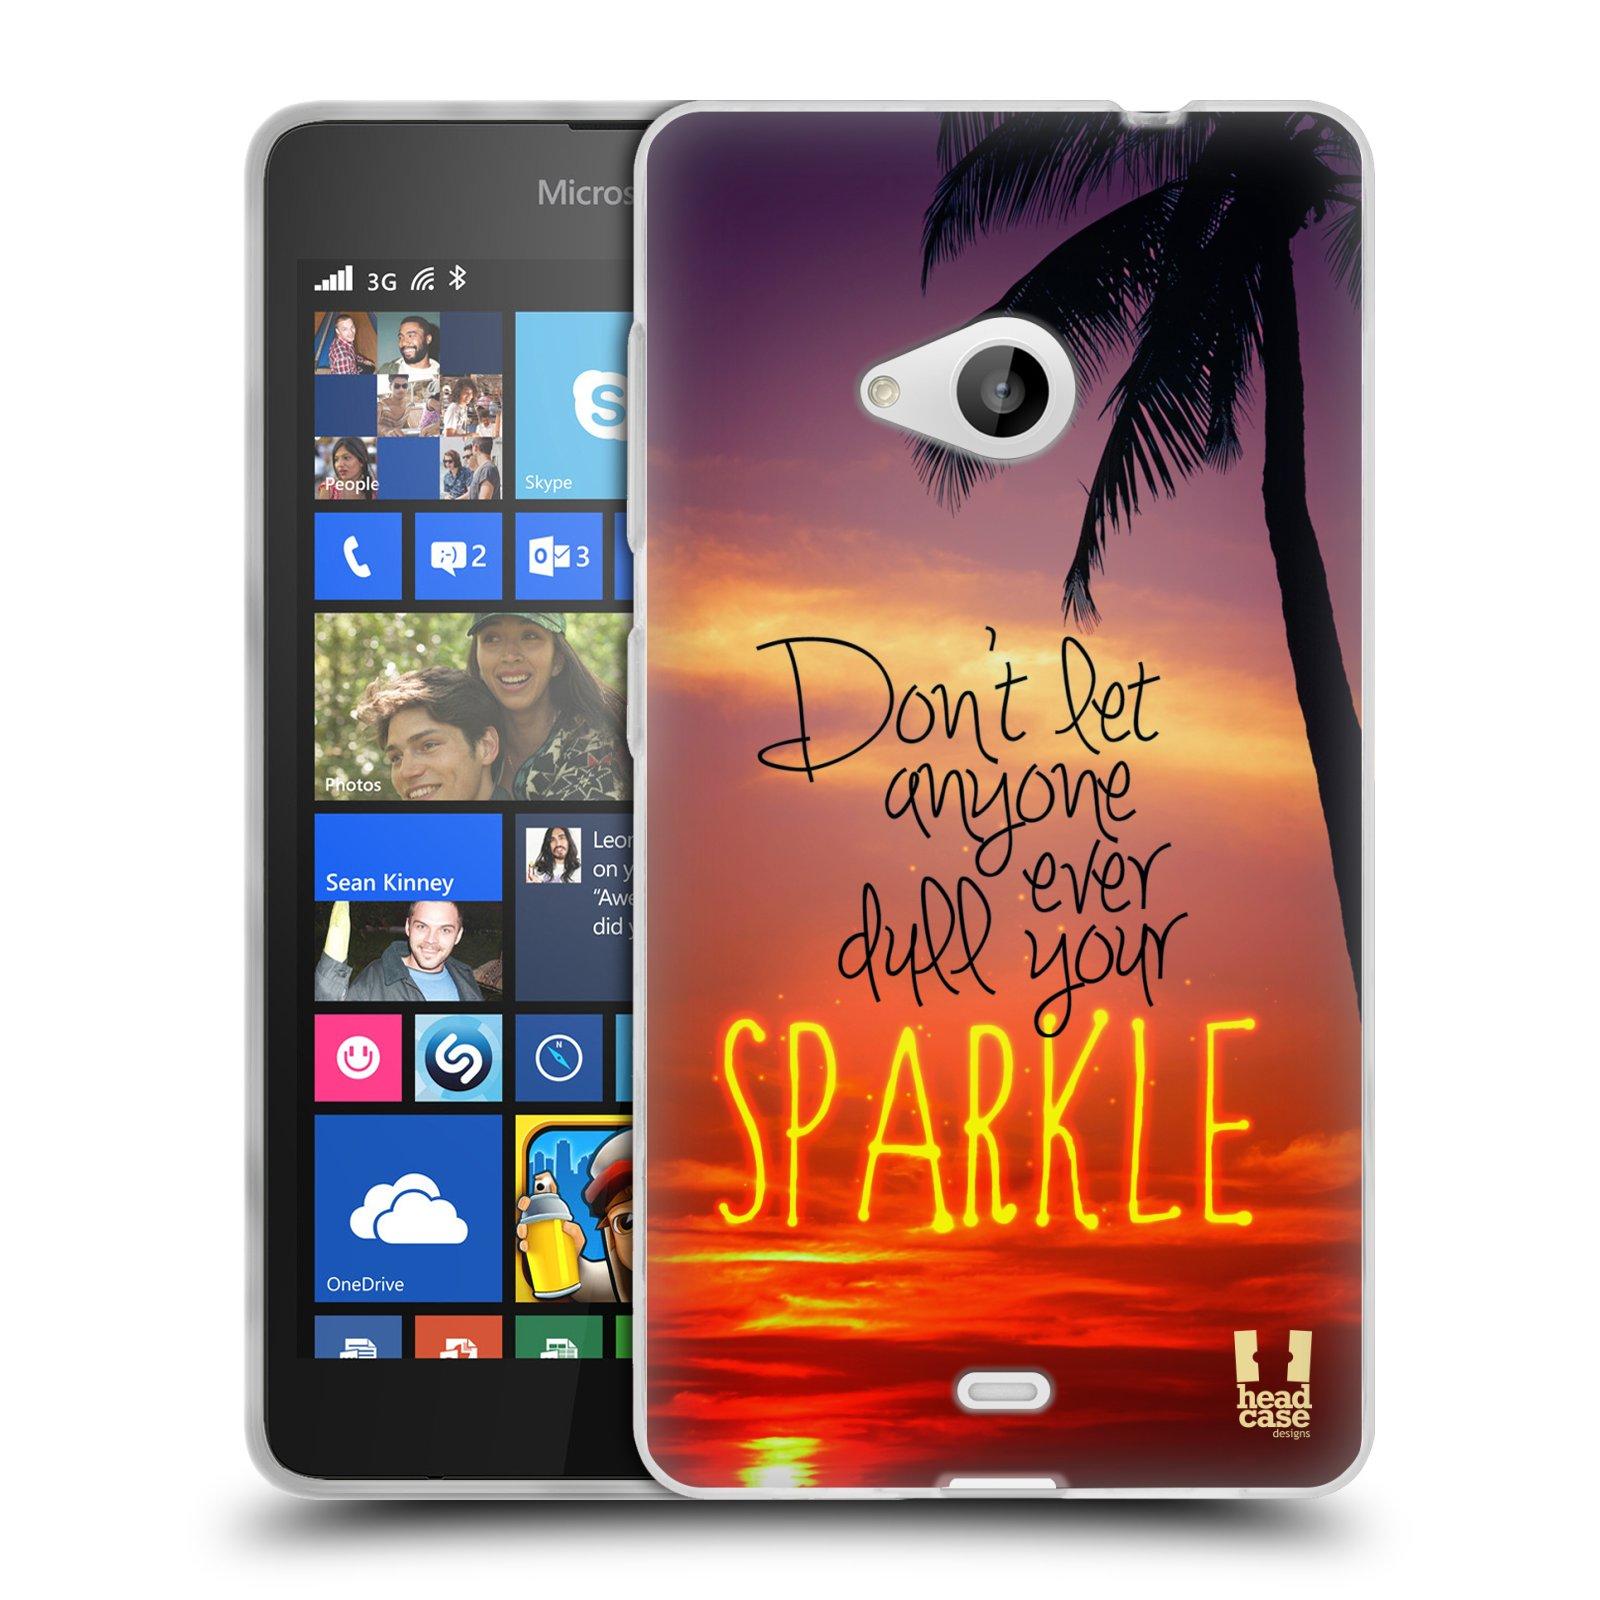 Silikonové pouzdro na mobil Microsoft Lumia 535 HEAD CASE SPARKLE (Silikonový kryt či obal na mobilní telefon Microsoft Lumia 535)